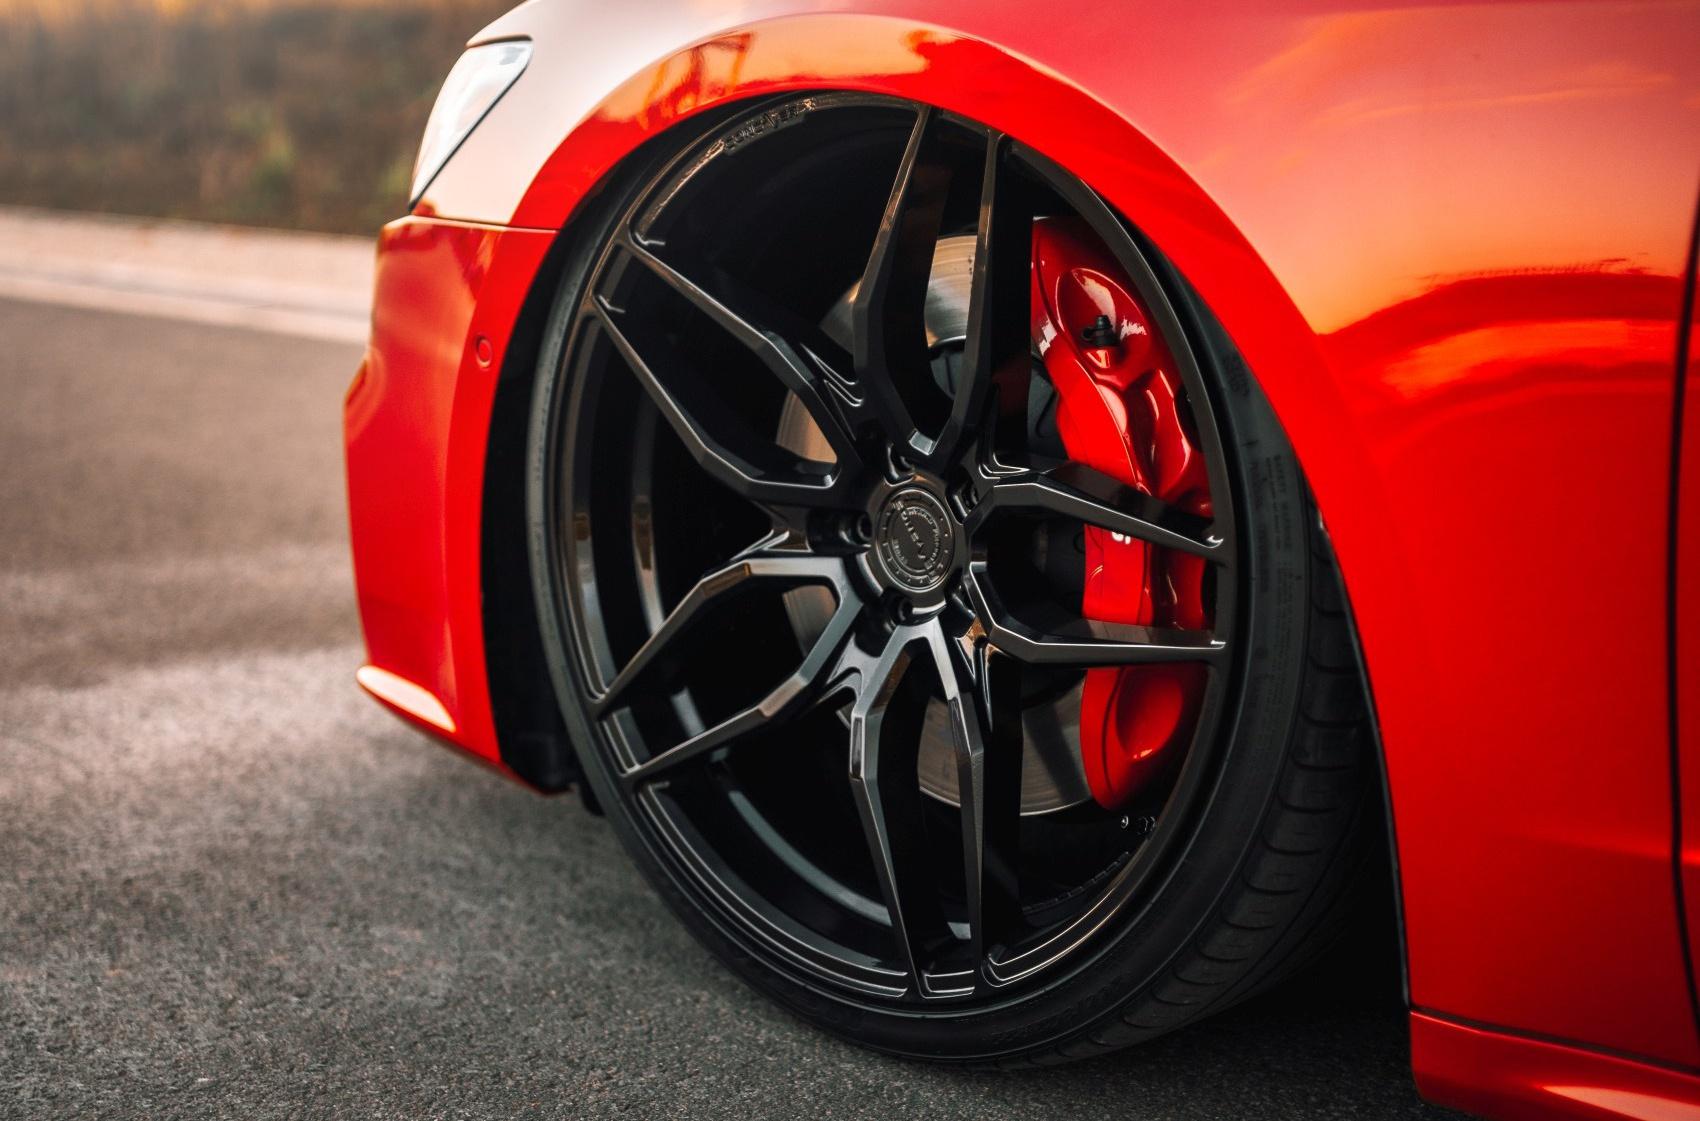 Audi A7 / S7 / RS7 Concaver CVR3 Platinum Black